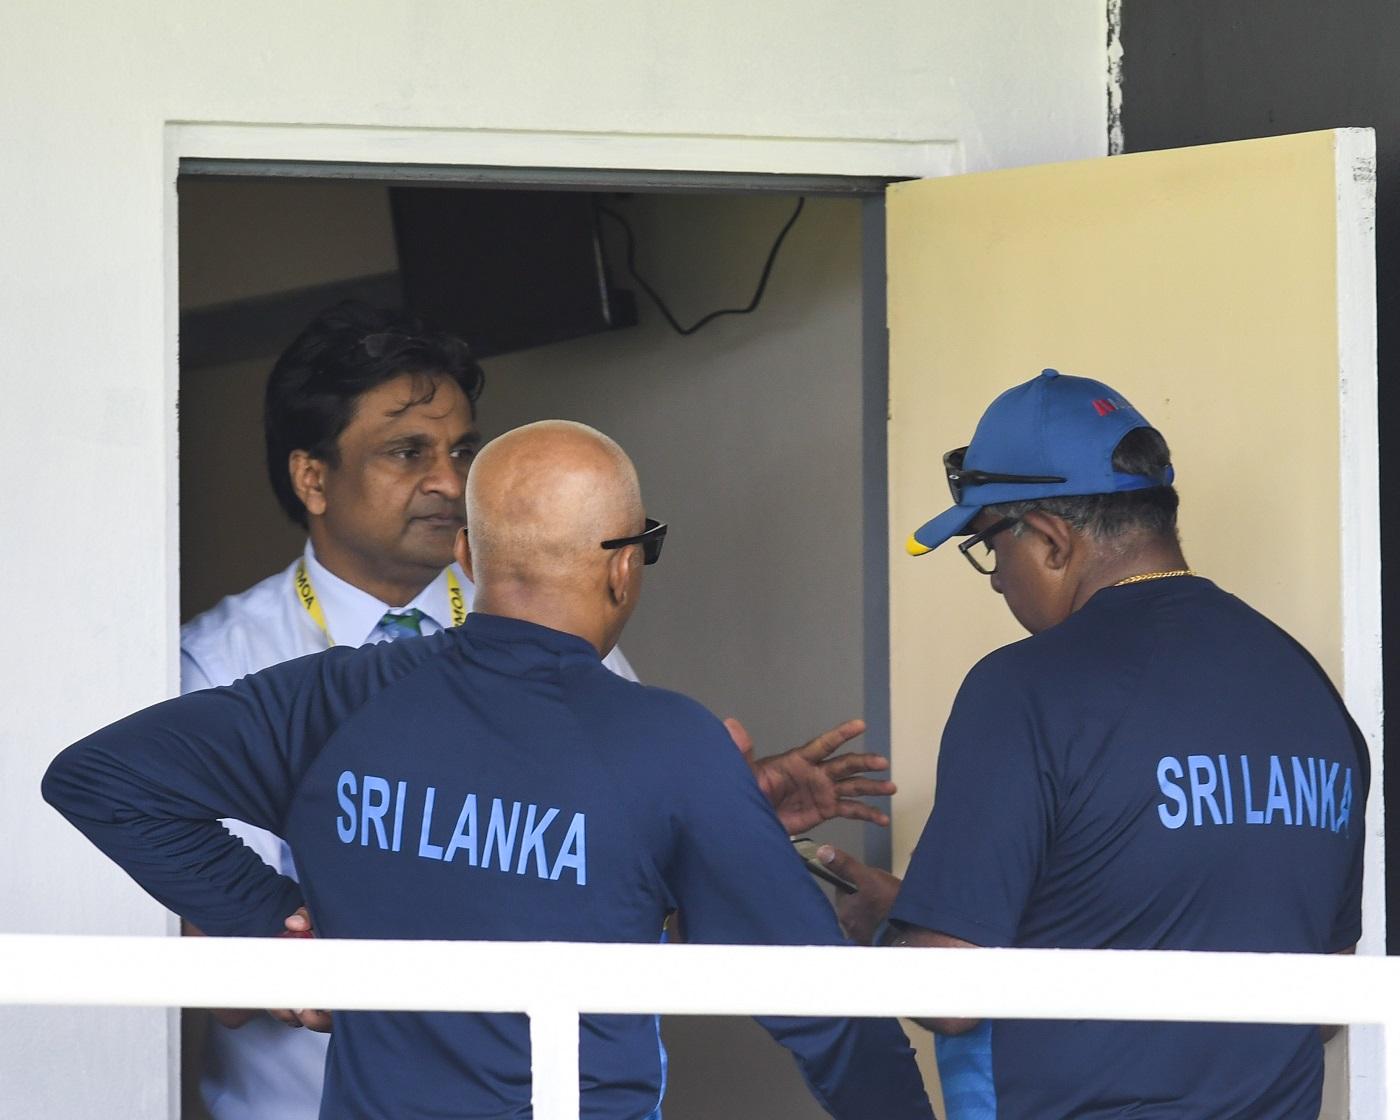 Dinesh Chandimal, Chandika Hathurusinghe, Asanka Gurusinha Out Of South Africa Tests